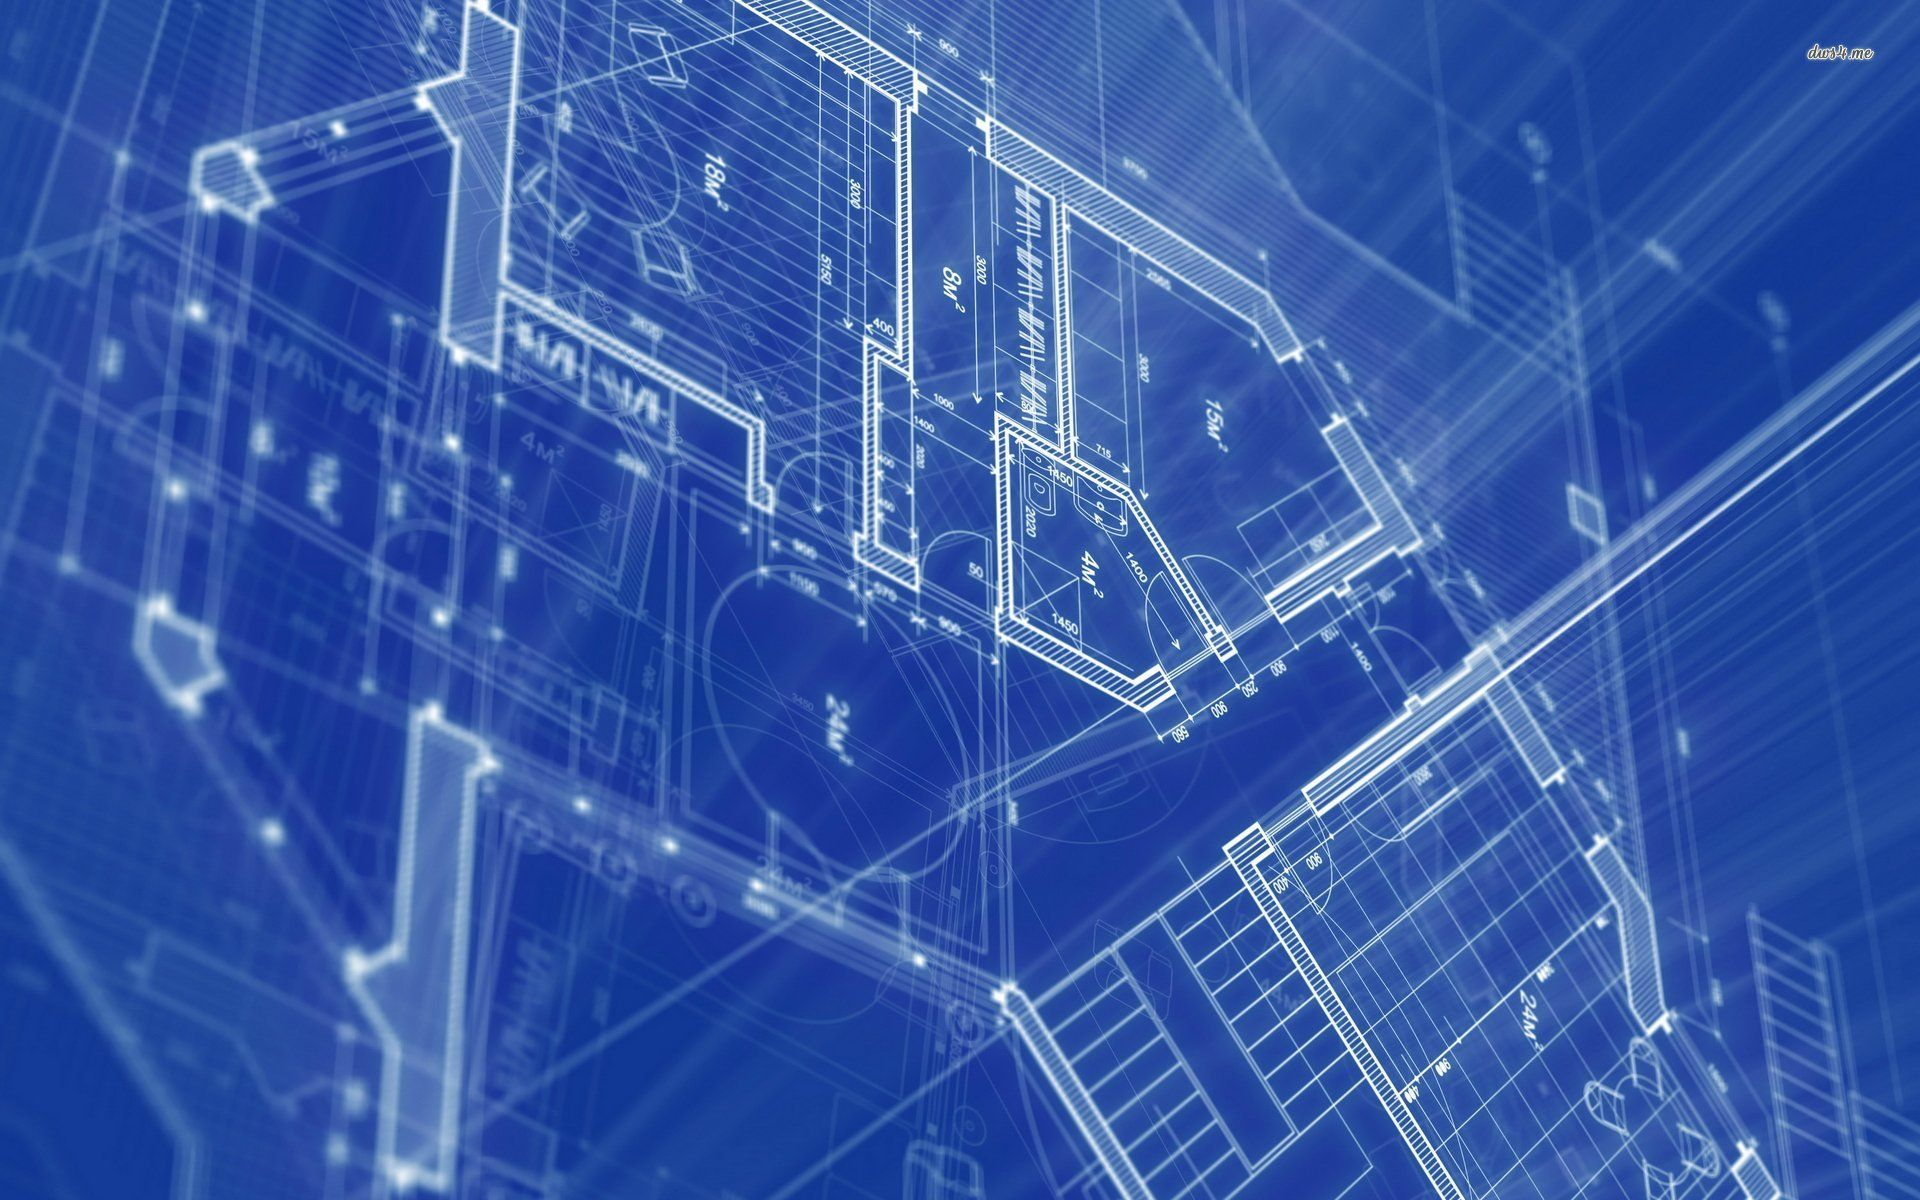 14845 blueprint 1920x1200 digital art wallpaperg 19201200 14845 blueprint 1920x1200 digital art wallpaperg 19201200 homesplans pinterest malvernweather Choice Image